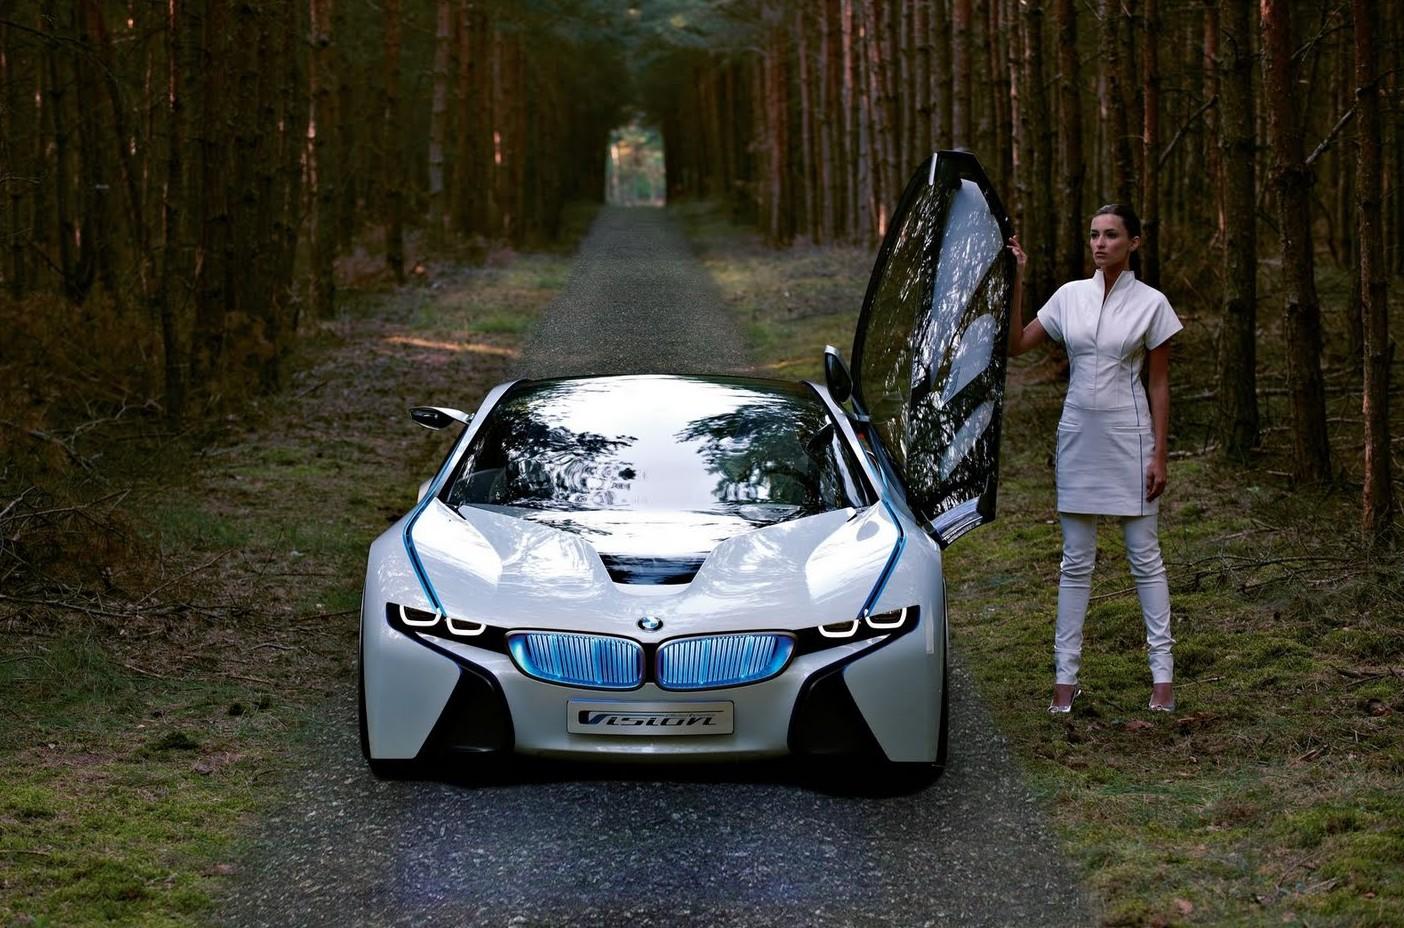 http://2.bp.blogspot.com/-m4VrRD5WnMg/Tk-j8FLOzgI/AAAAAAAAAXE/6M5smSI3uqY/s1600/2013-BMW-i8-Luxury-Car-Pictures-e1310205206688.jpg